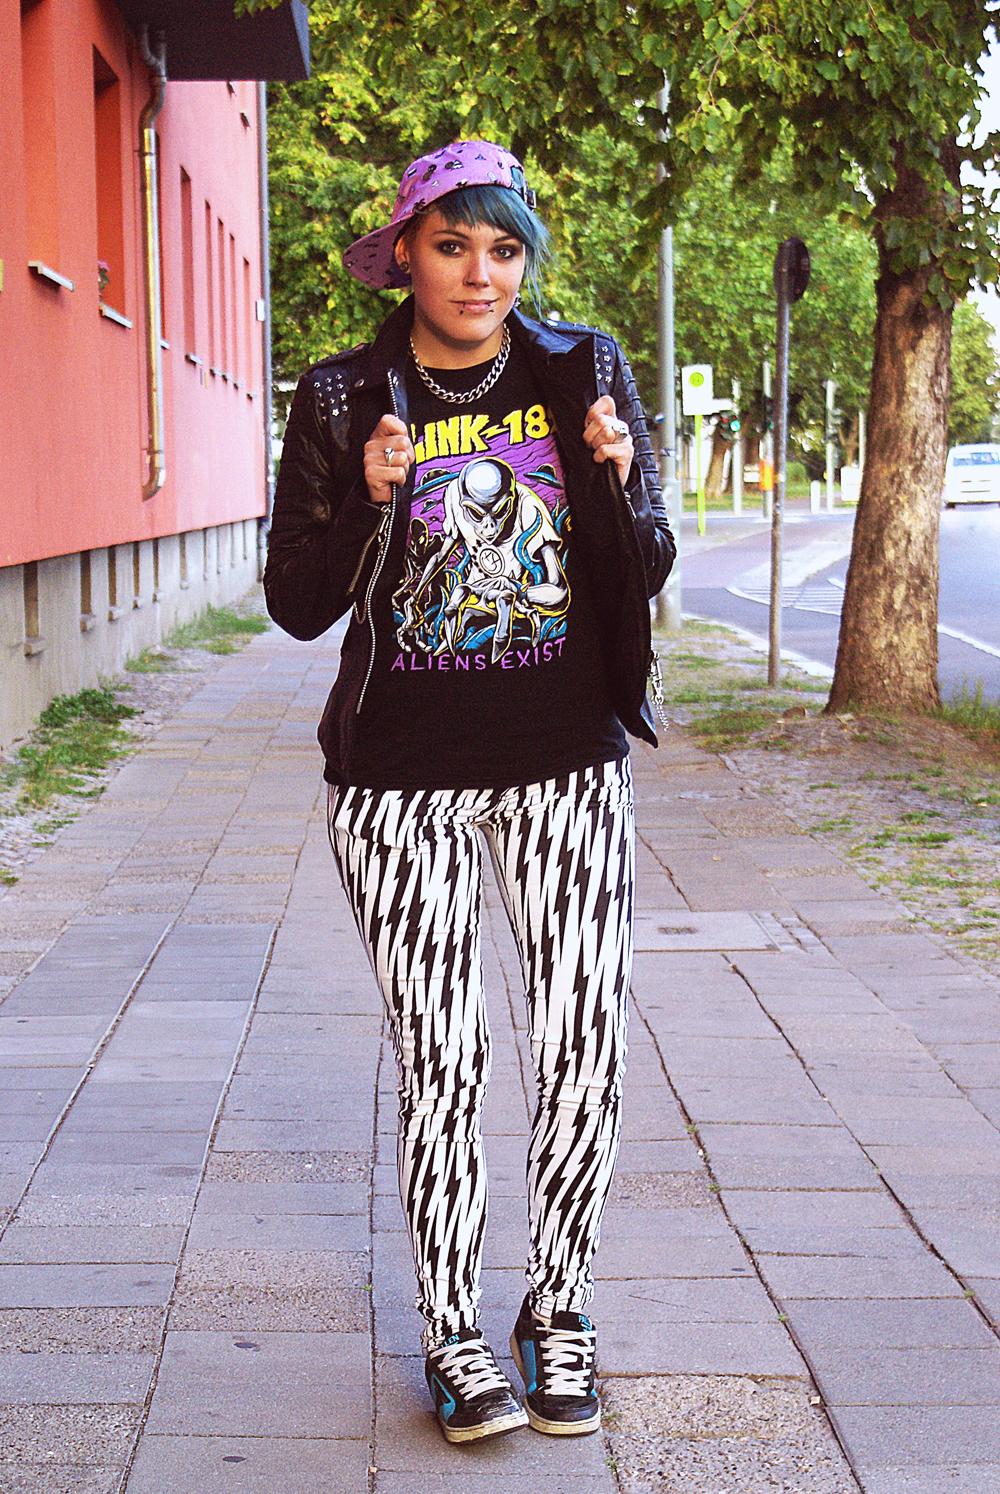 tripp nyc lightning bolt jeans fallen shoes cyan blink aliens exist shirt glamour kills holiday cap lavender purple leather jacket real biker moto chain bandshirt rock